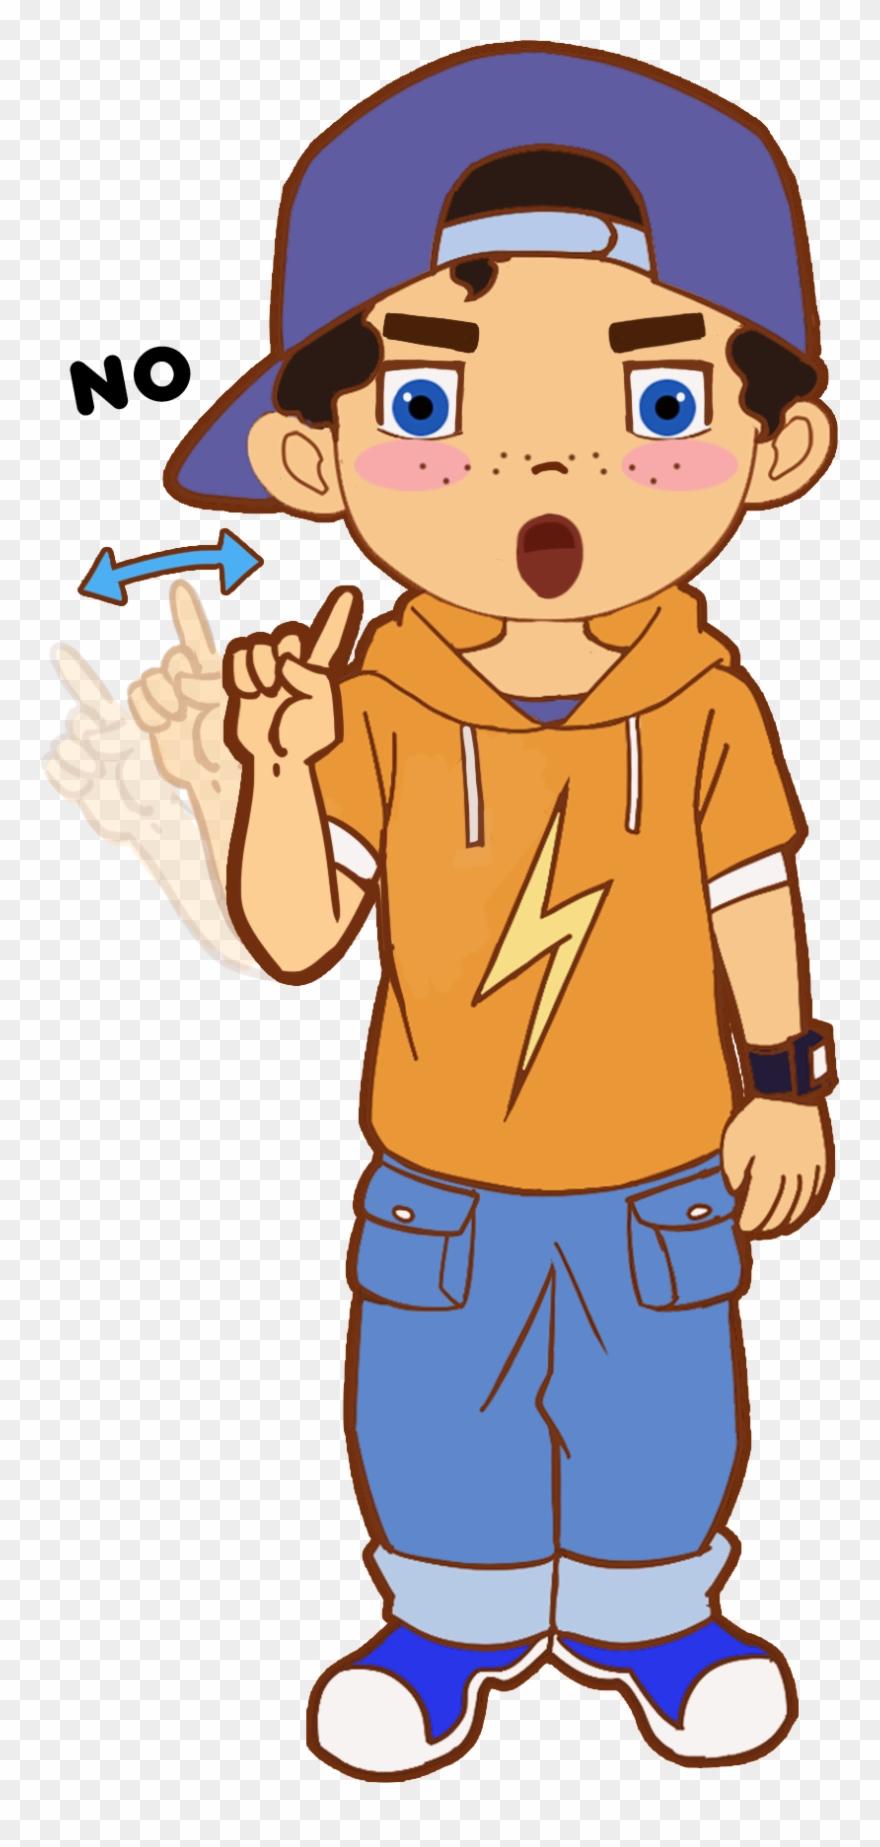 Vipkid Teacher's Portal Vip Kid, Portal, Clip Art,.